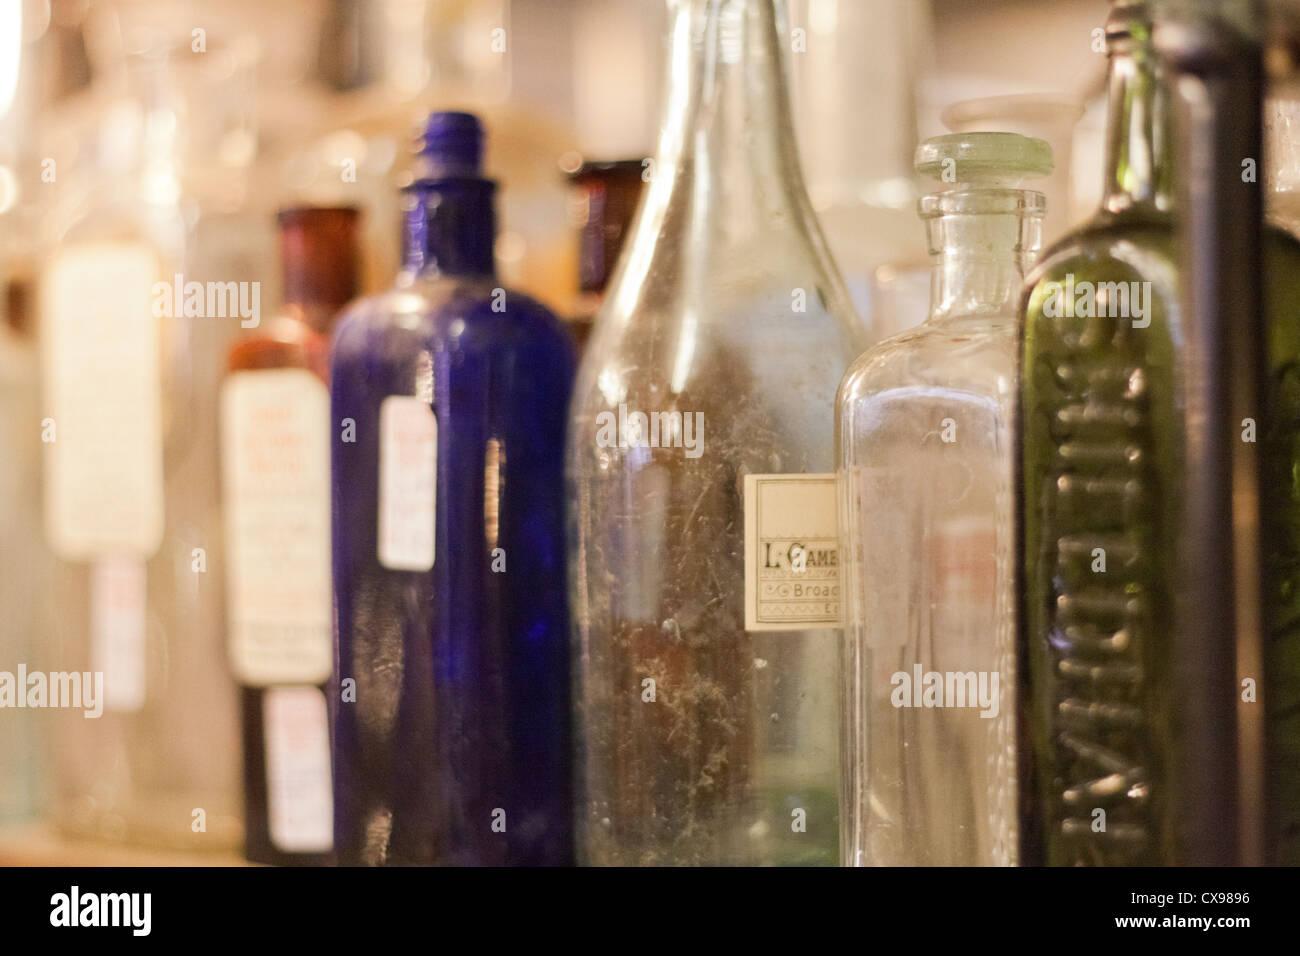 Old Glass Bottles Part - 36: Old Glass Bottles On A Shelf